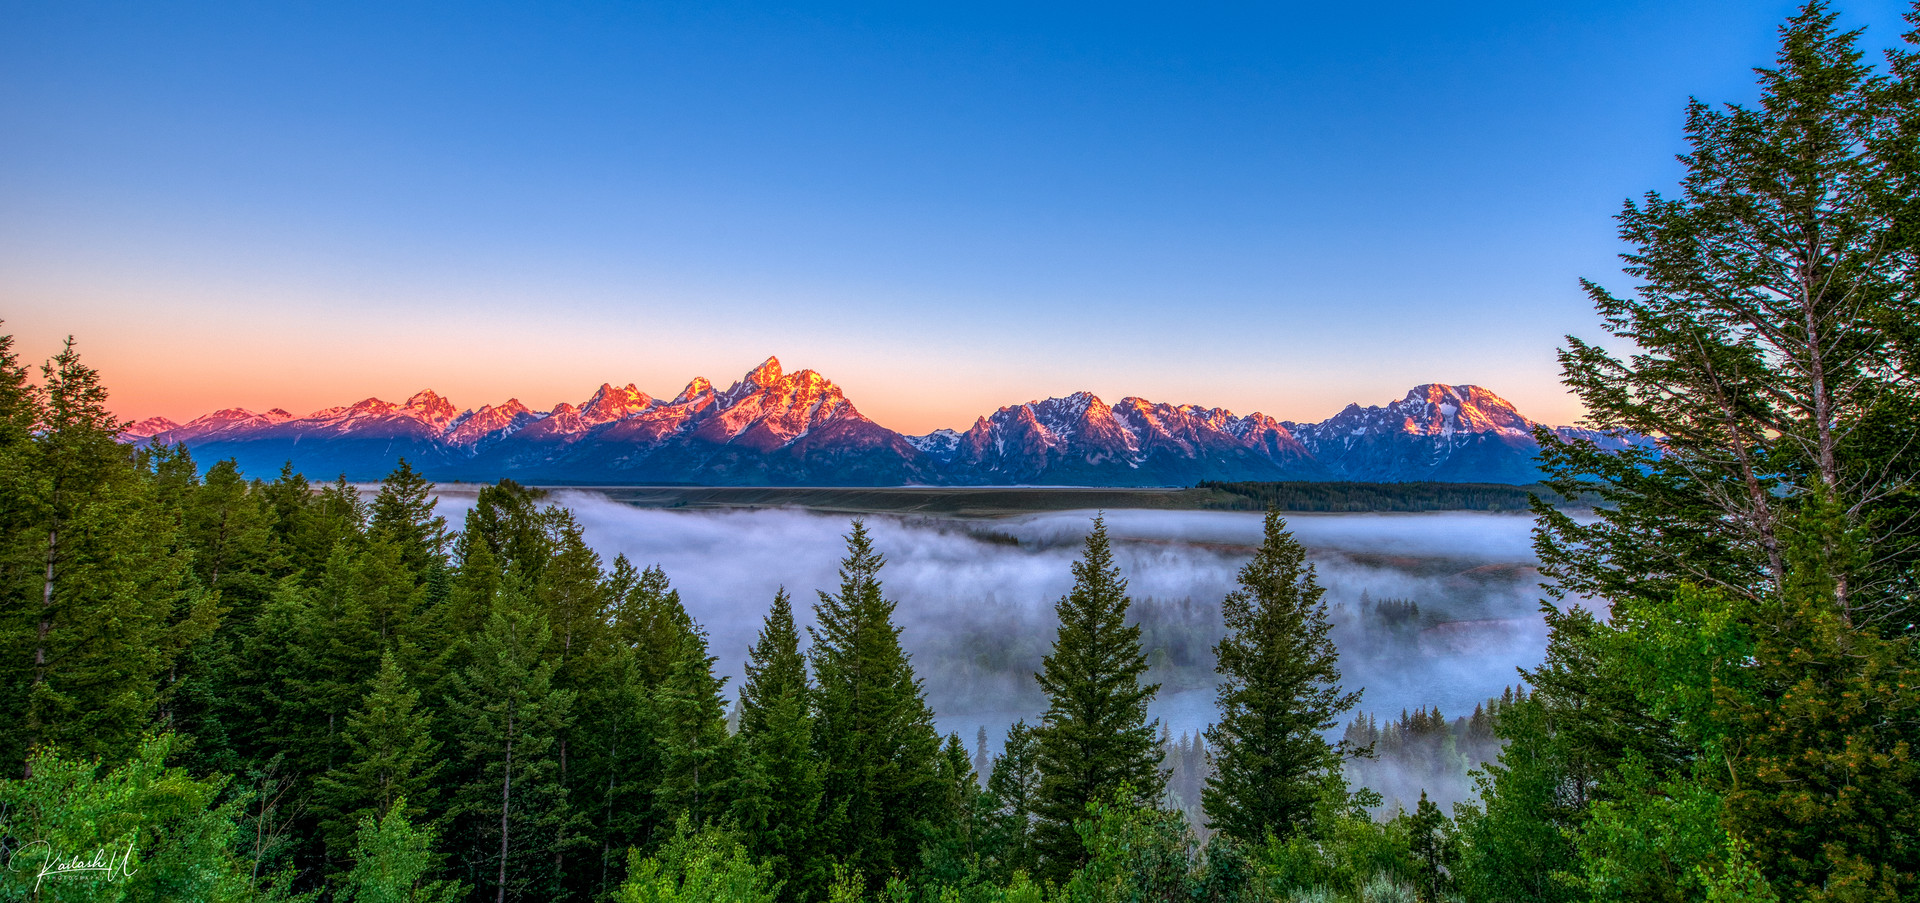 Grand Teton Alpenglow, WY